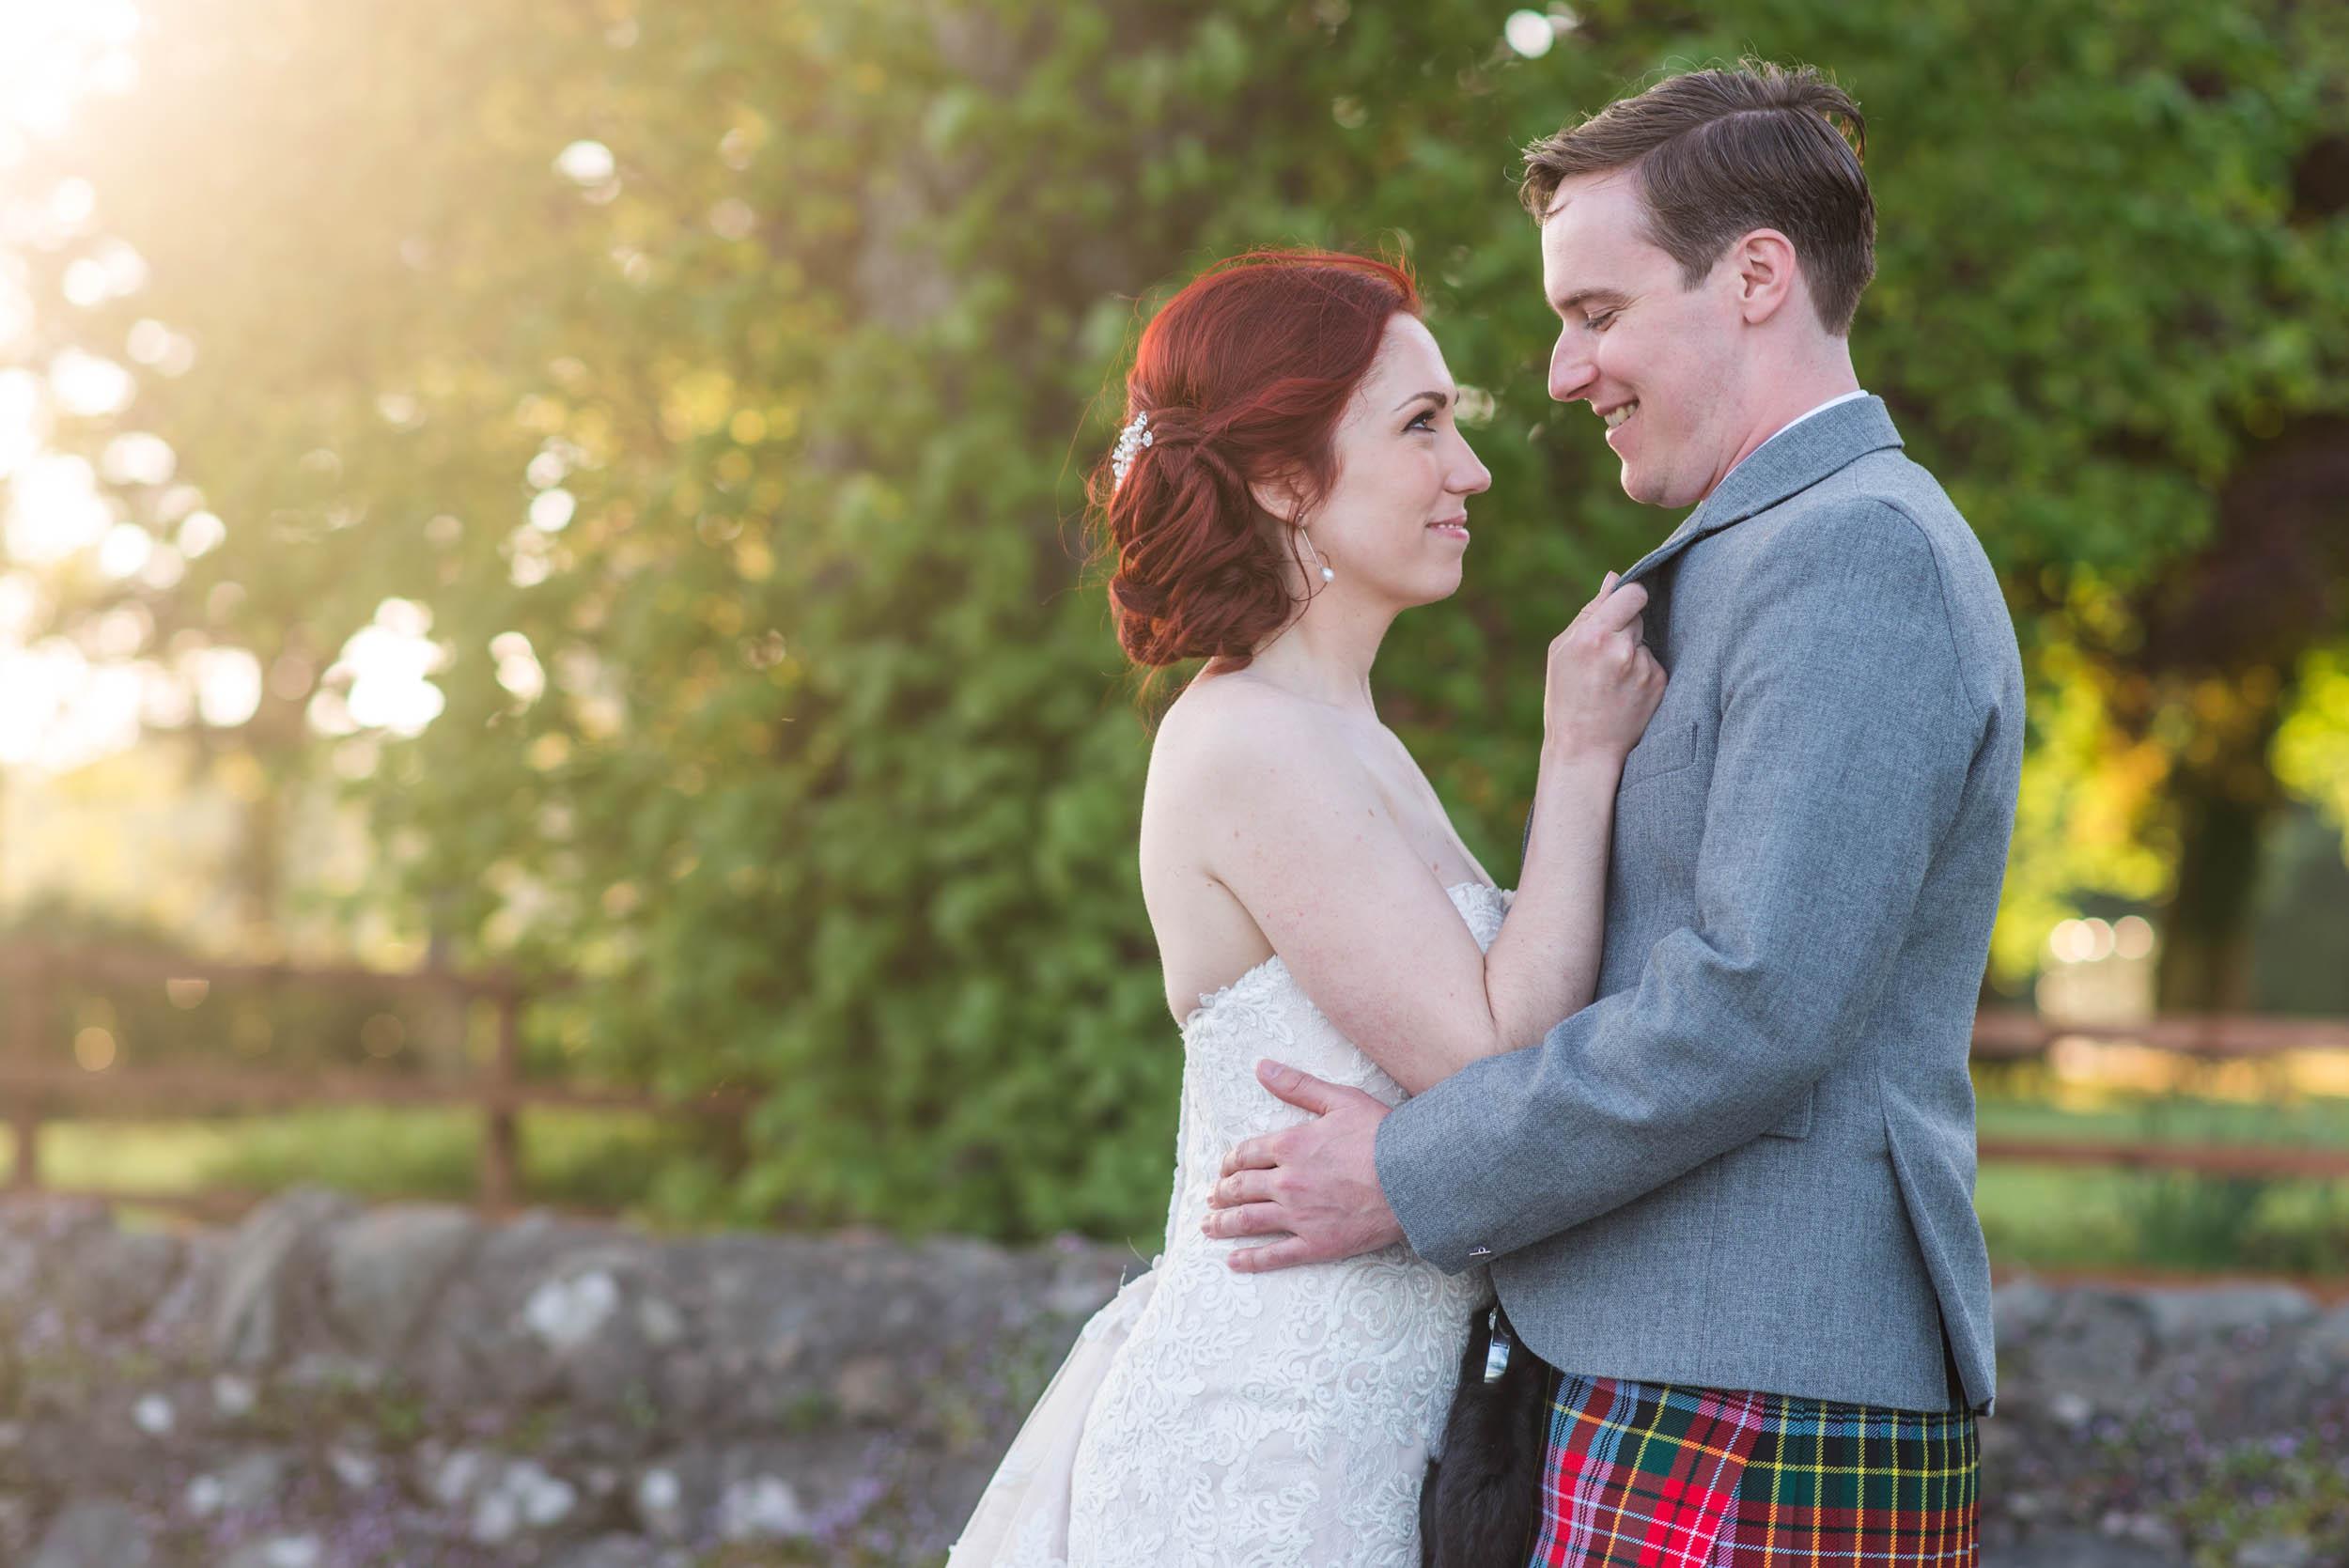 Weddings-Paul-Saunders-Photography-5888.jpg